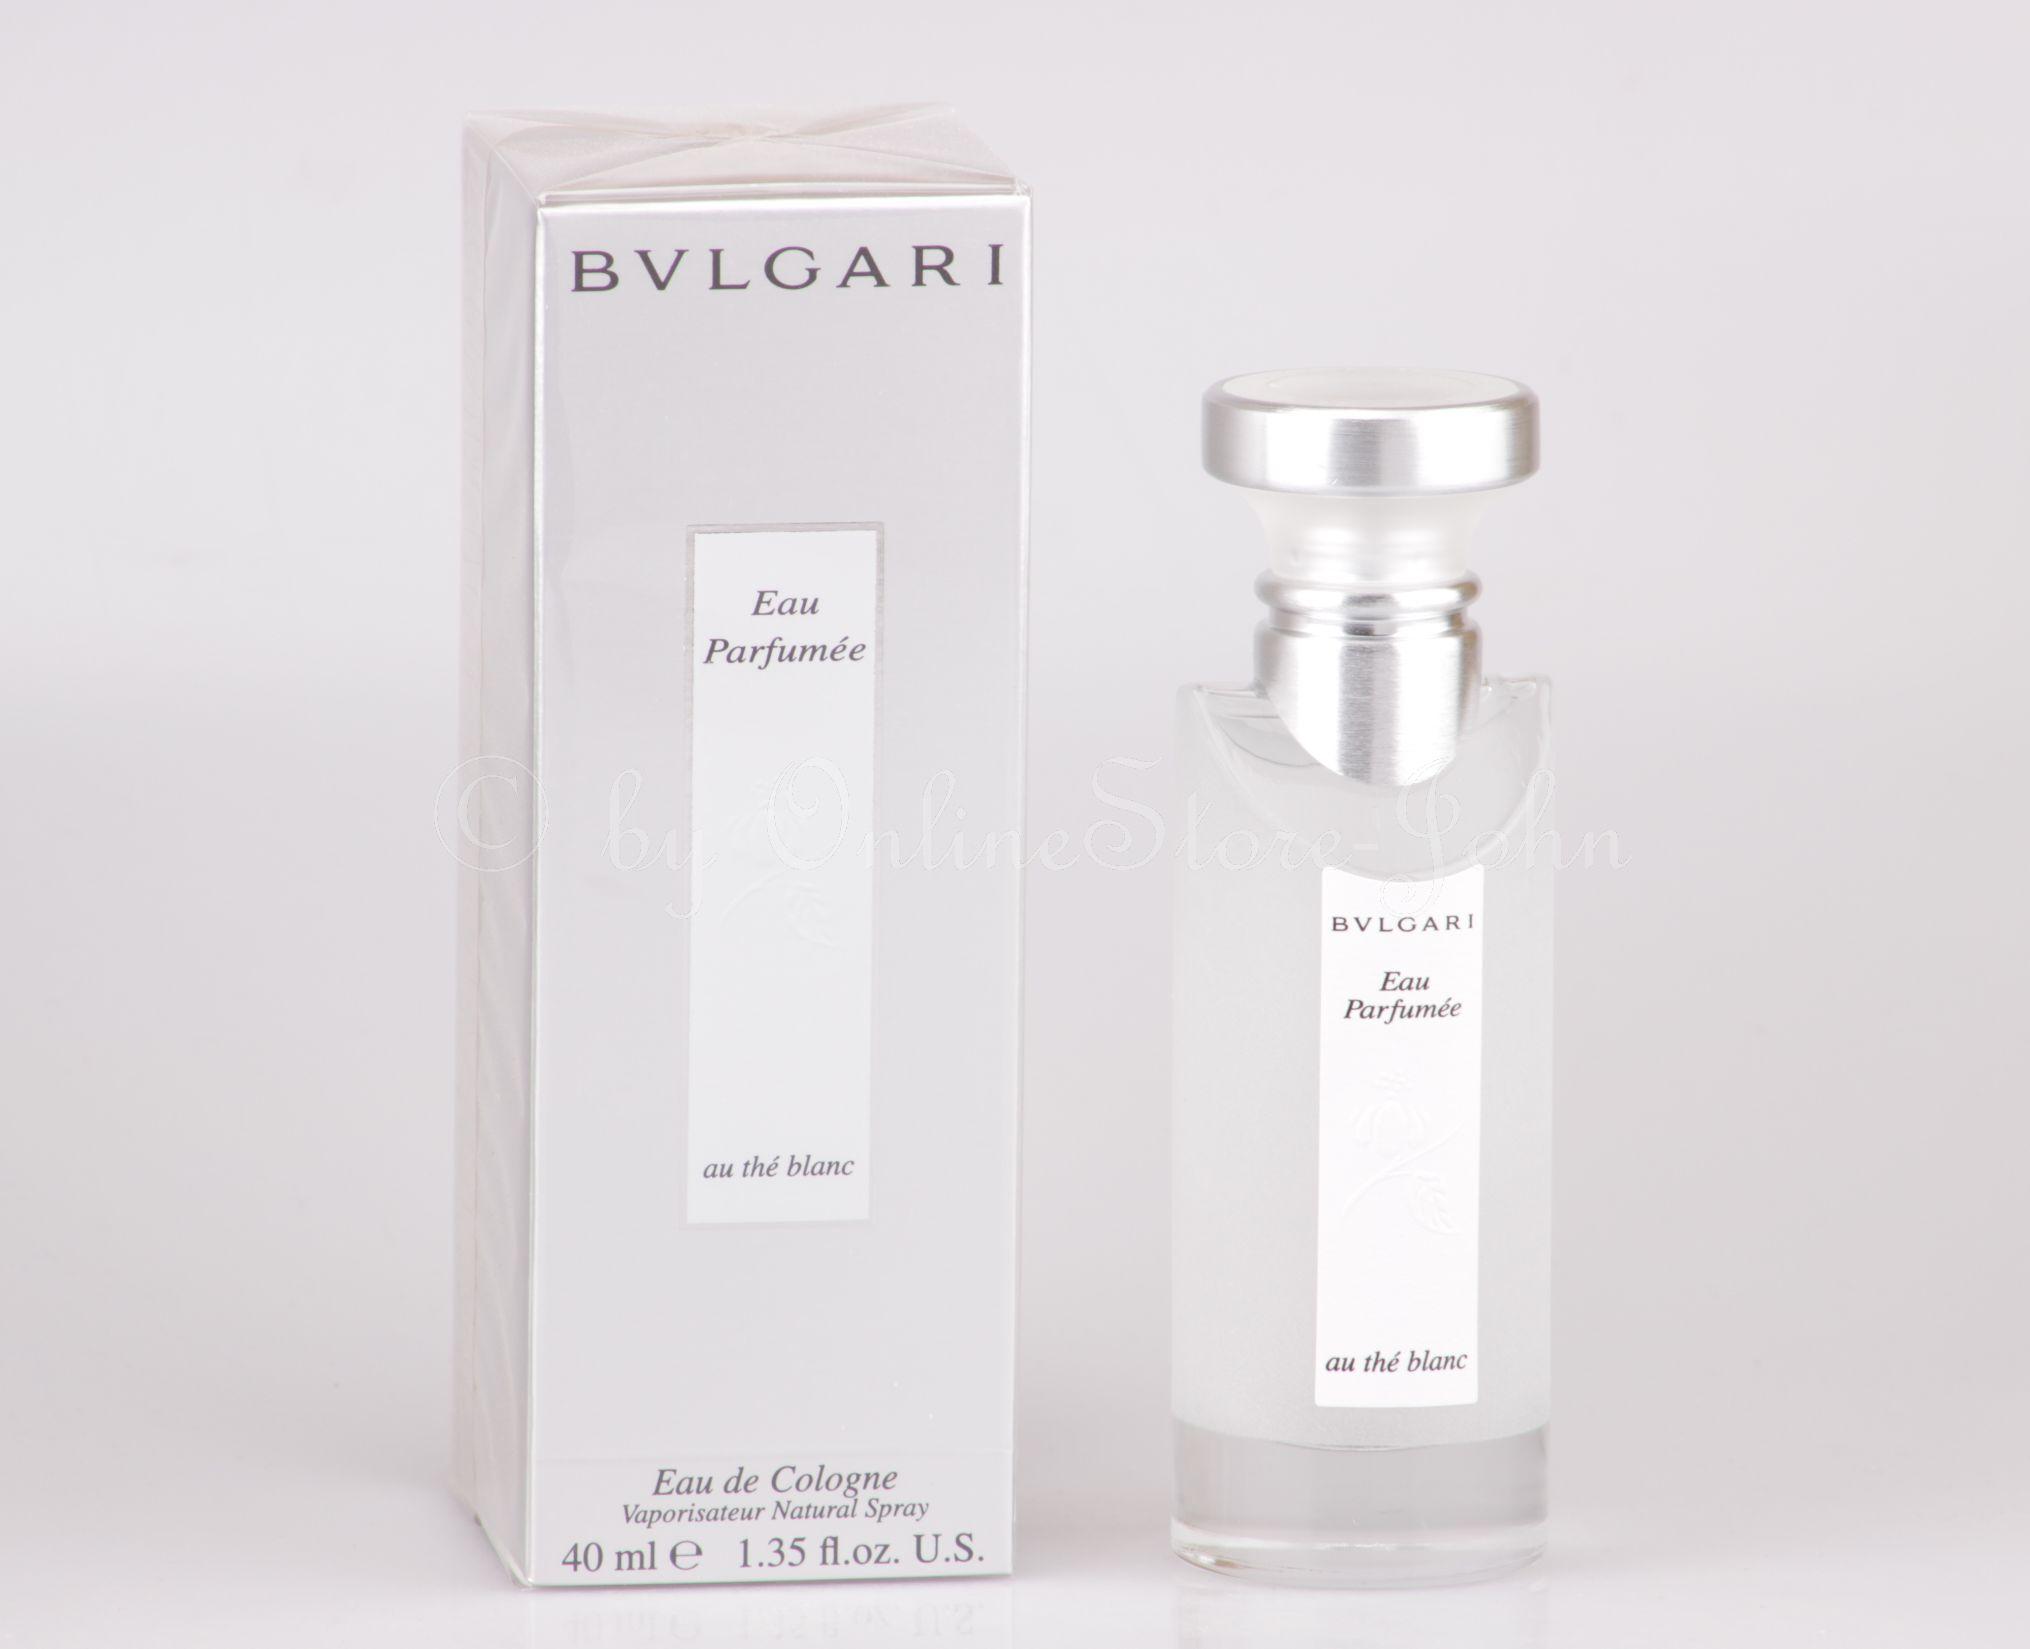 Bvlgari - Eau Parfumee Au the Blanc - 40ml EDC Eau de Cologne bd44704b568